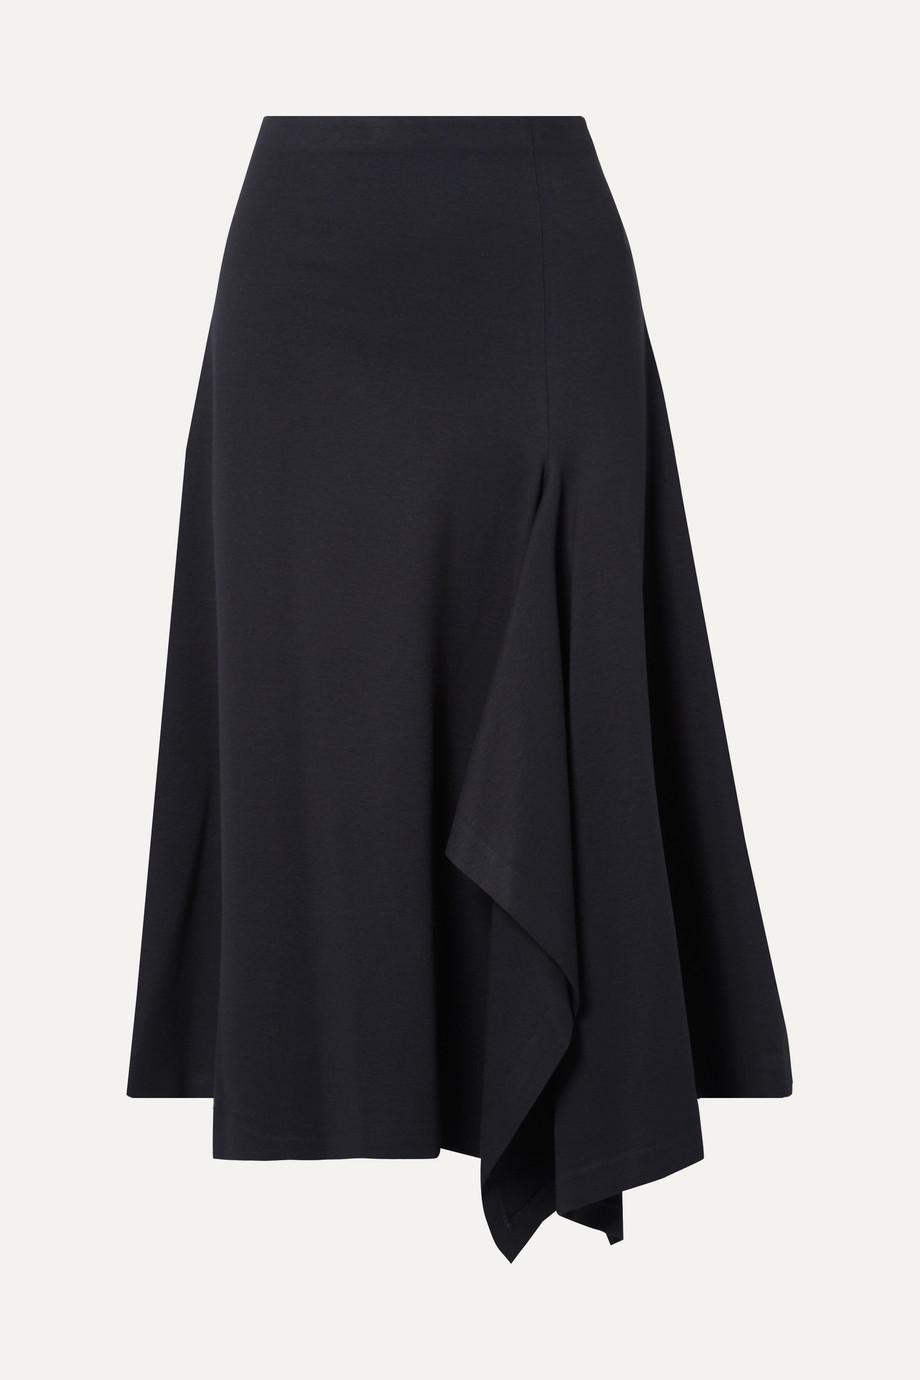 Rosetta Getty Draped stretch-jersey midi skirt